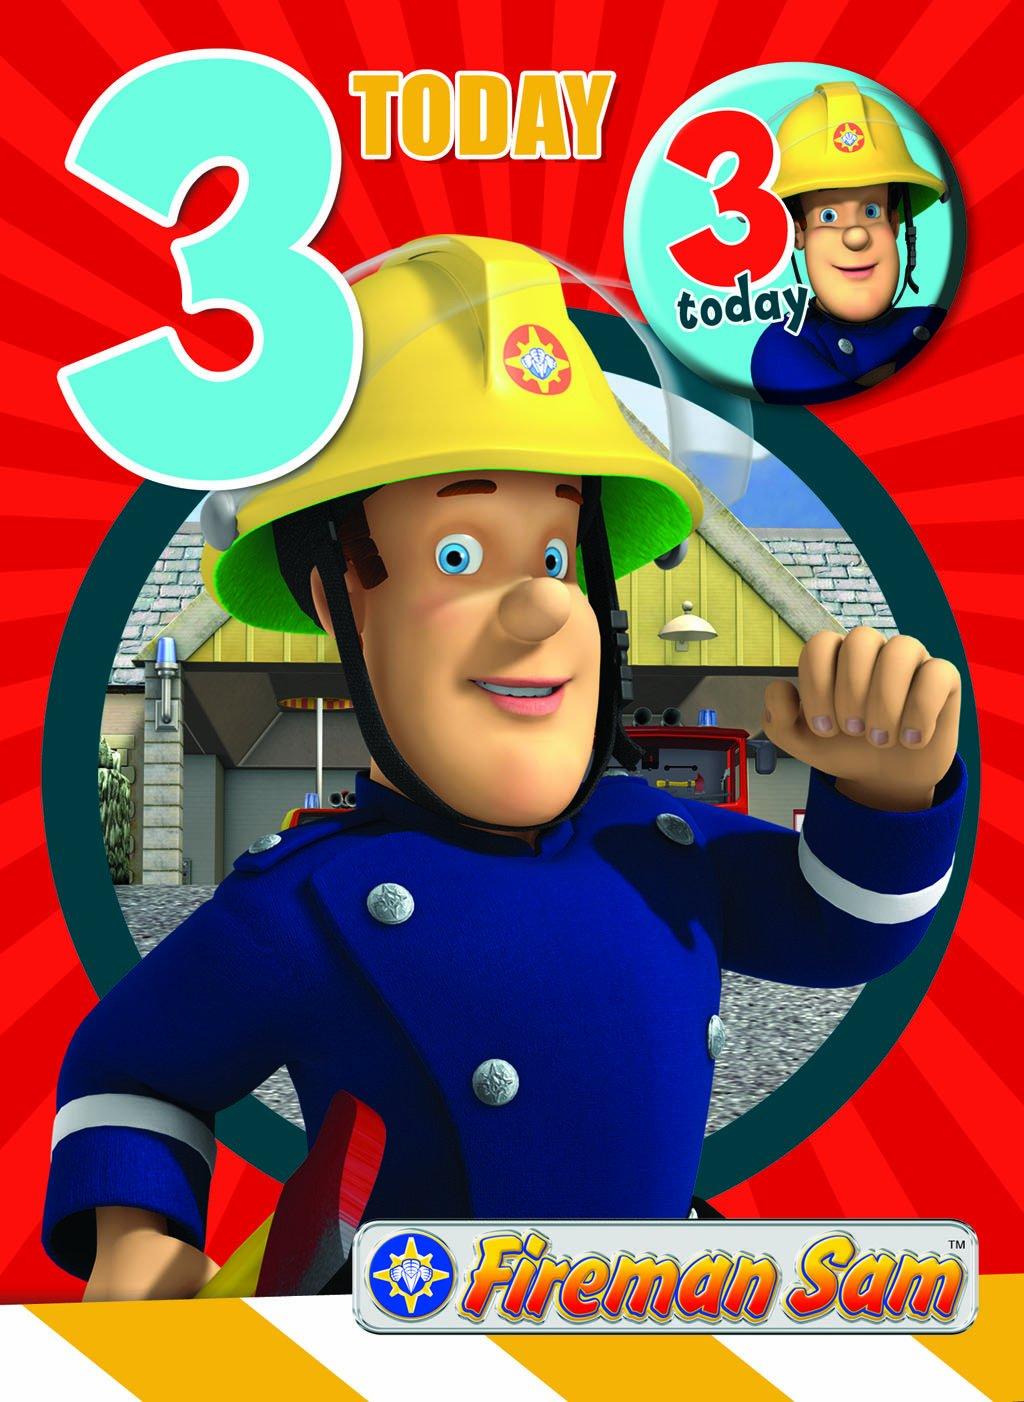 Fireman Sam FS003 - Tarjeta de cumpleaños para niños que ...